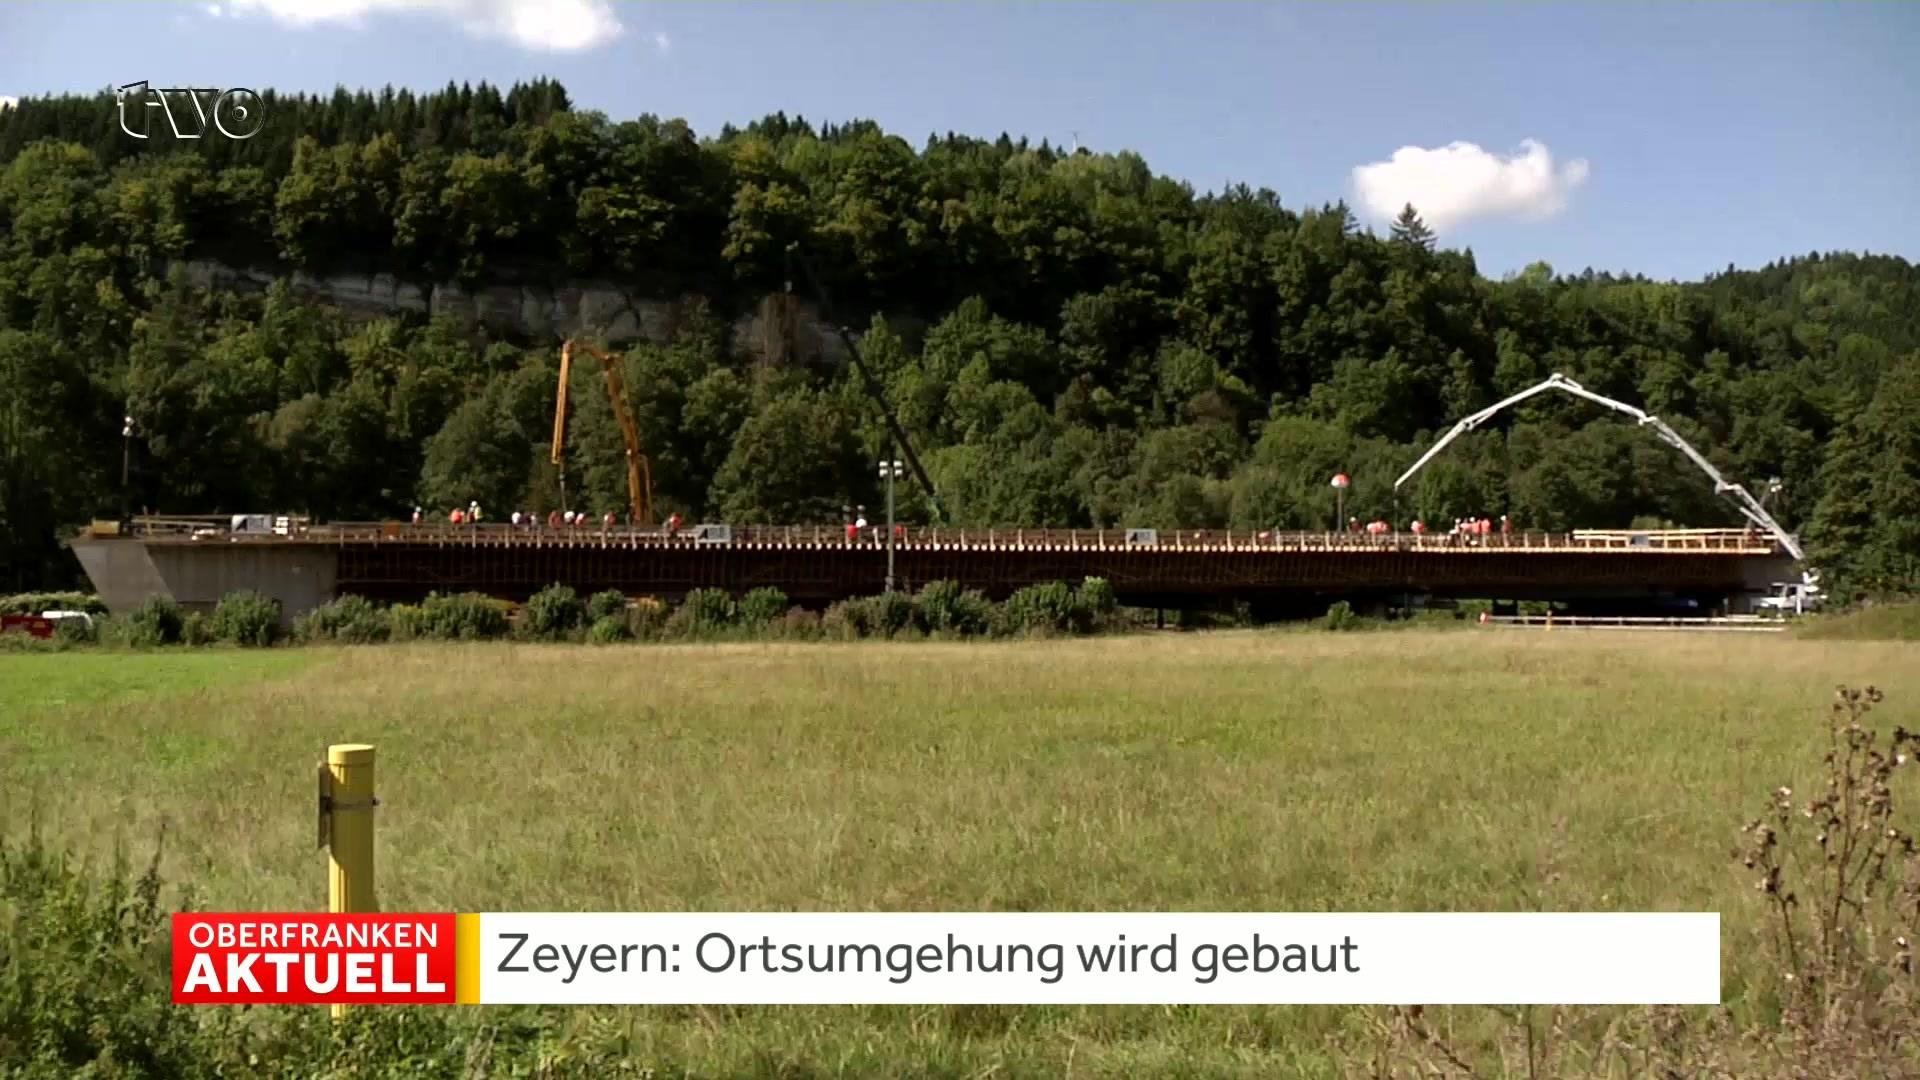 TVO-Kurznachrichten vom 04. September 2017 | tvo.de